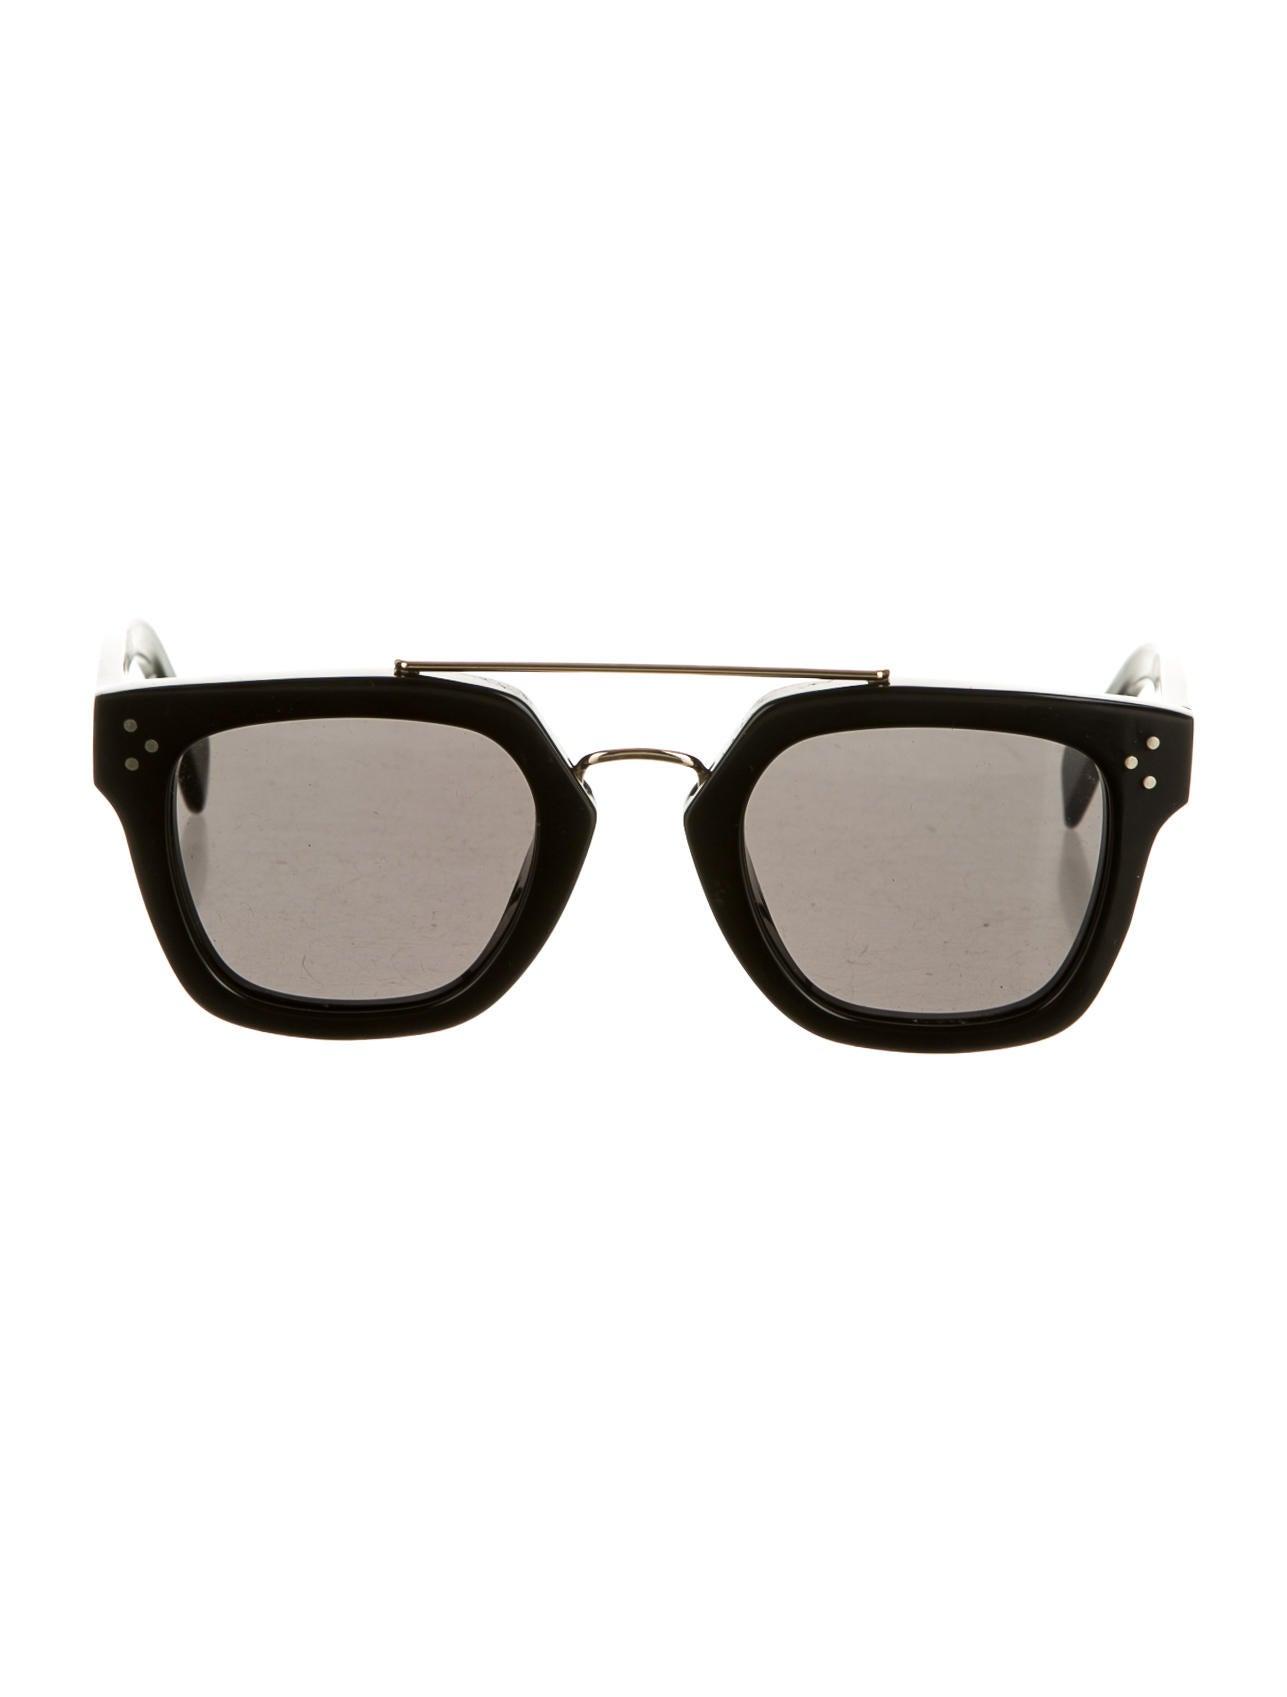 Contemporary Flatware C 233 Line Sunglasses Accessories Cel24965 The Realreal